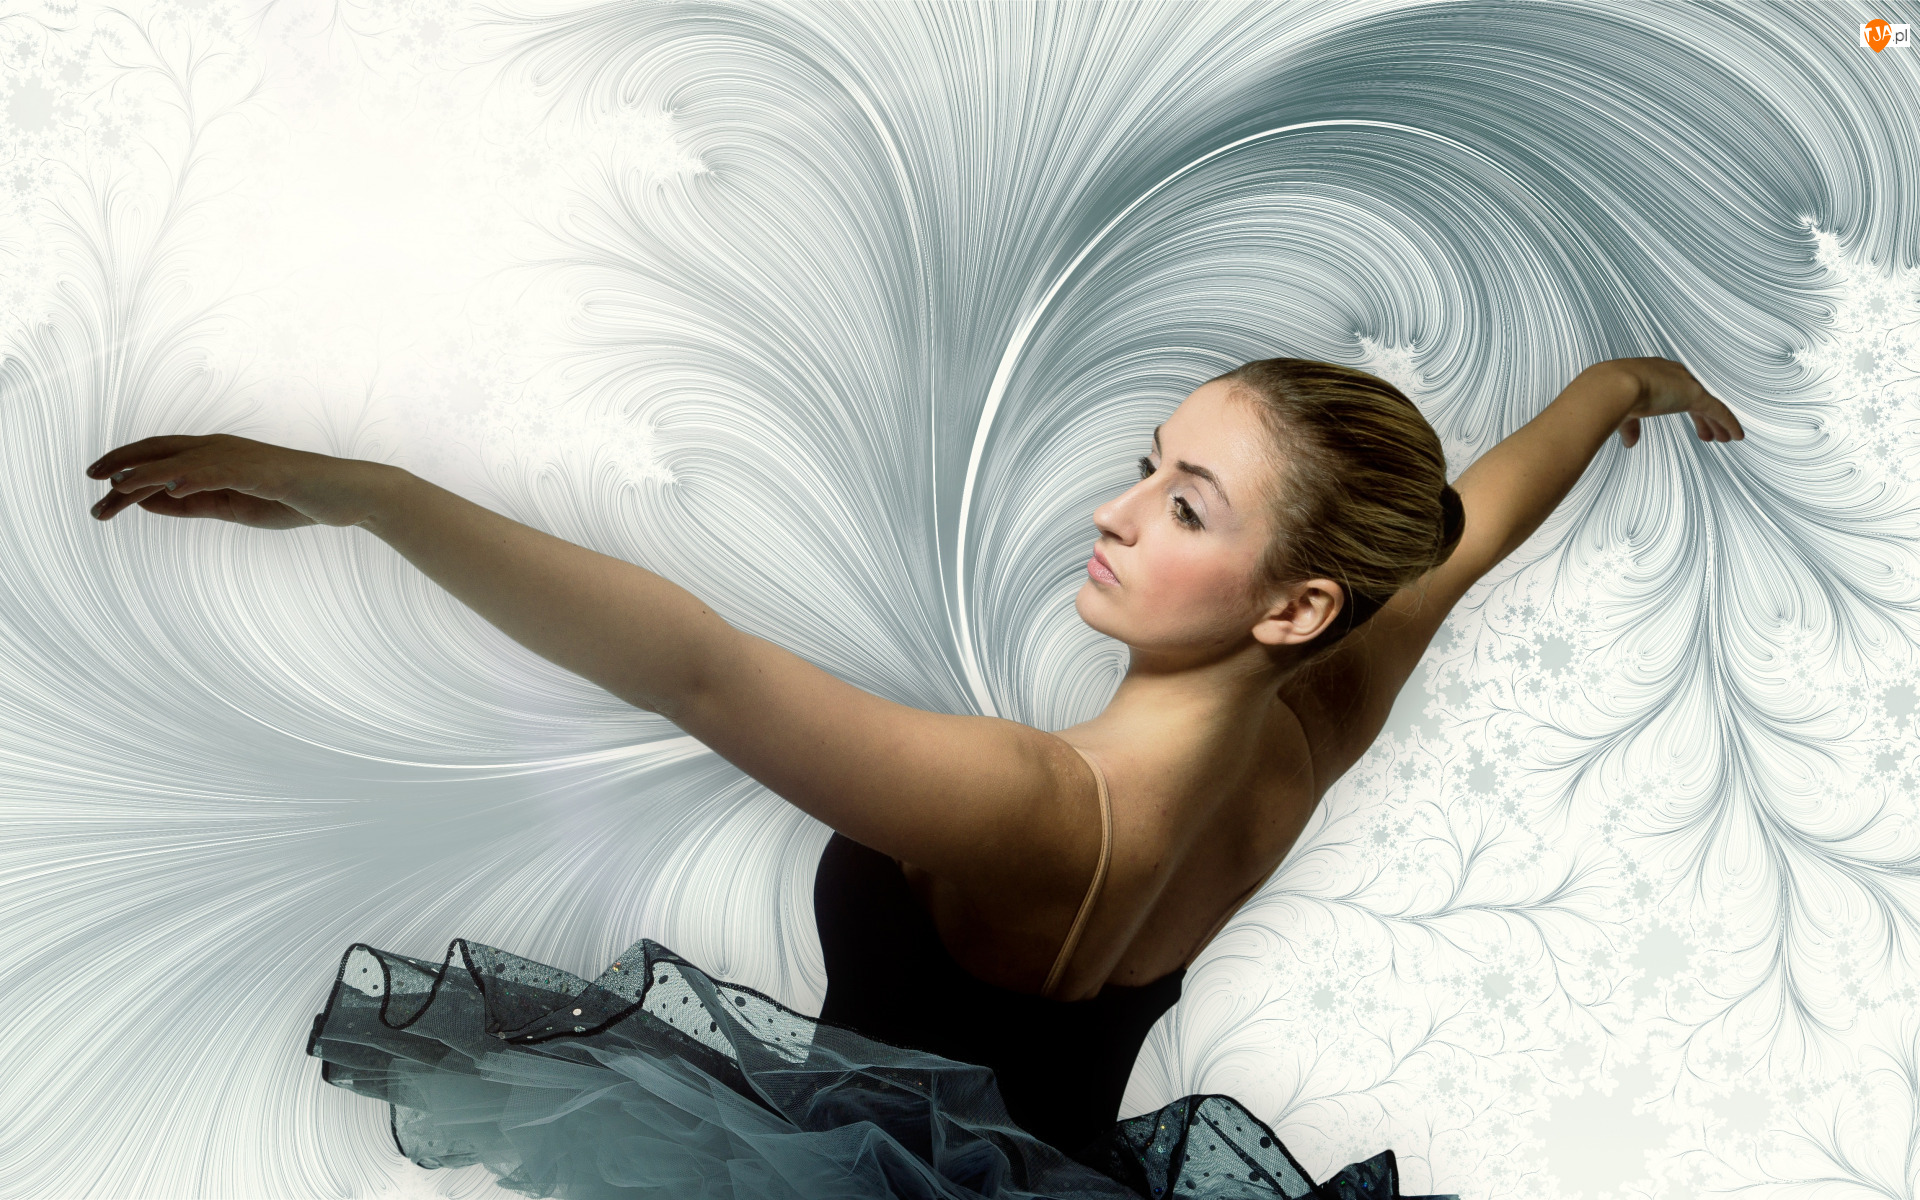 Taniec, Kobieta, Balerina, Baletnica